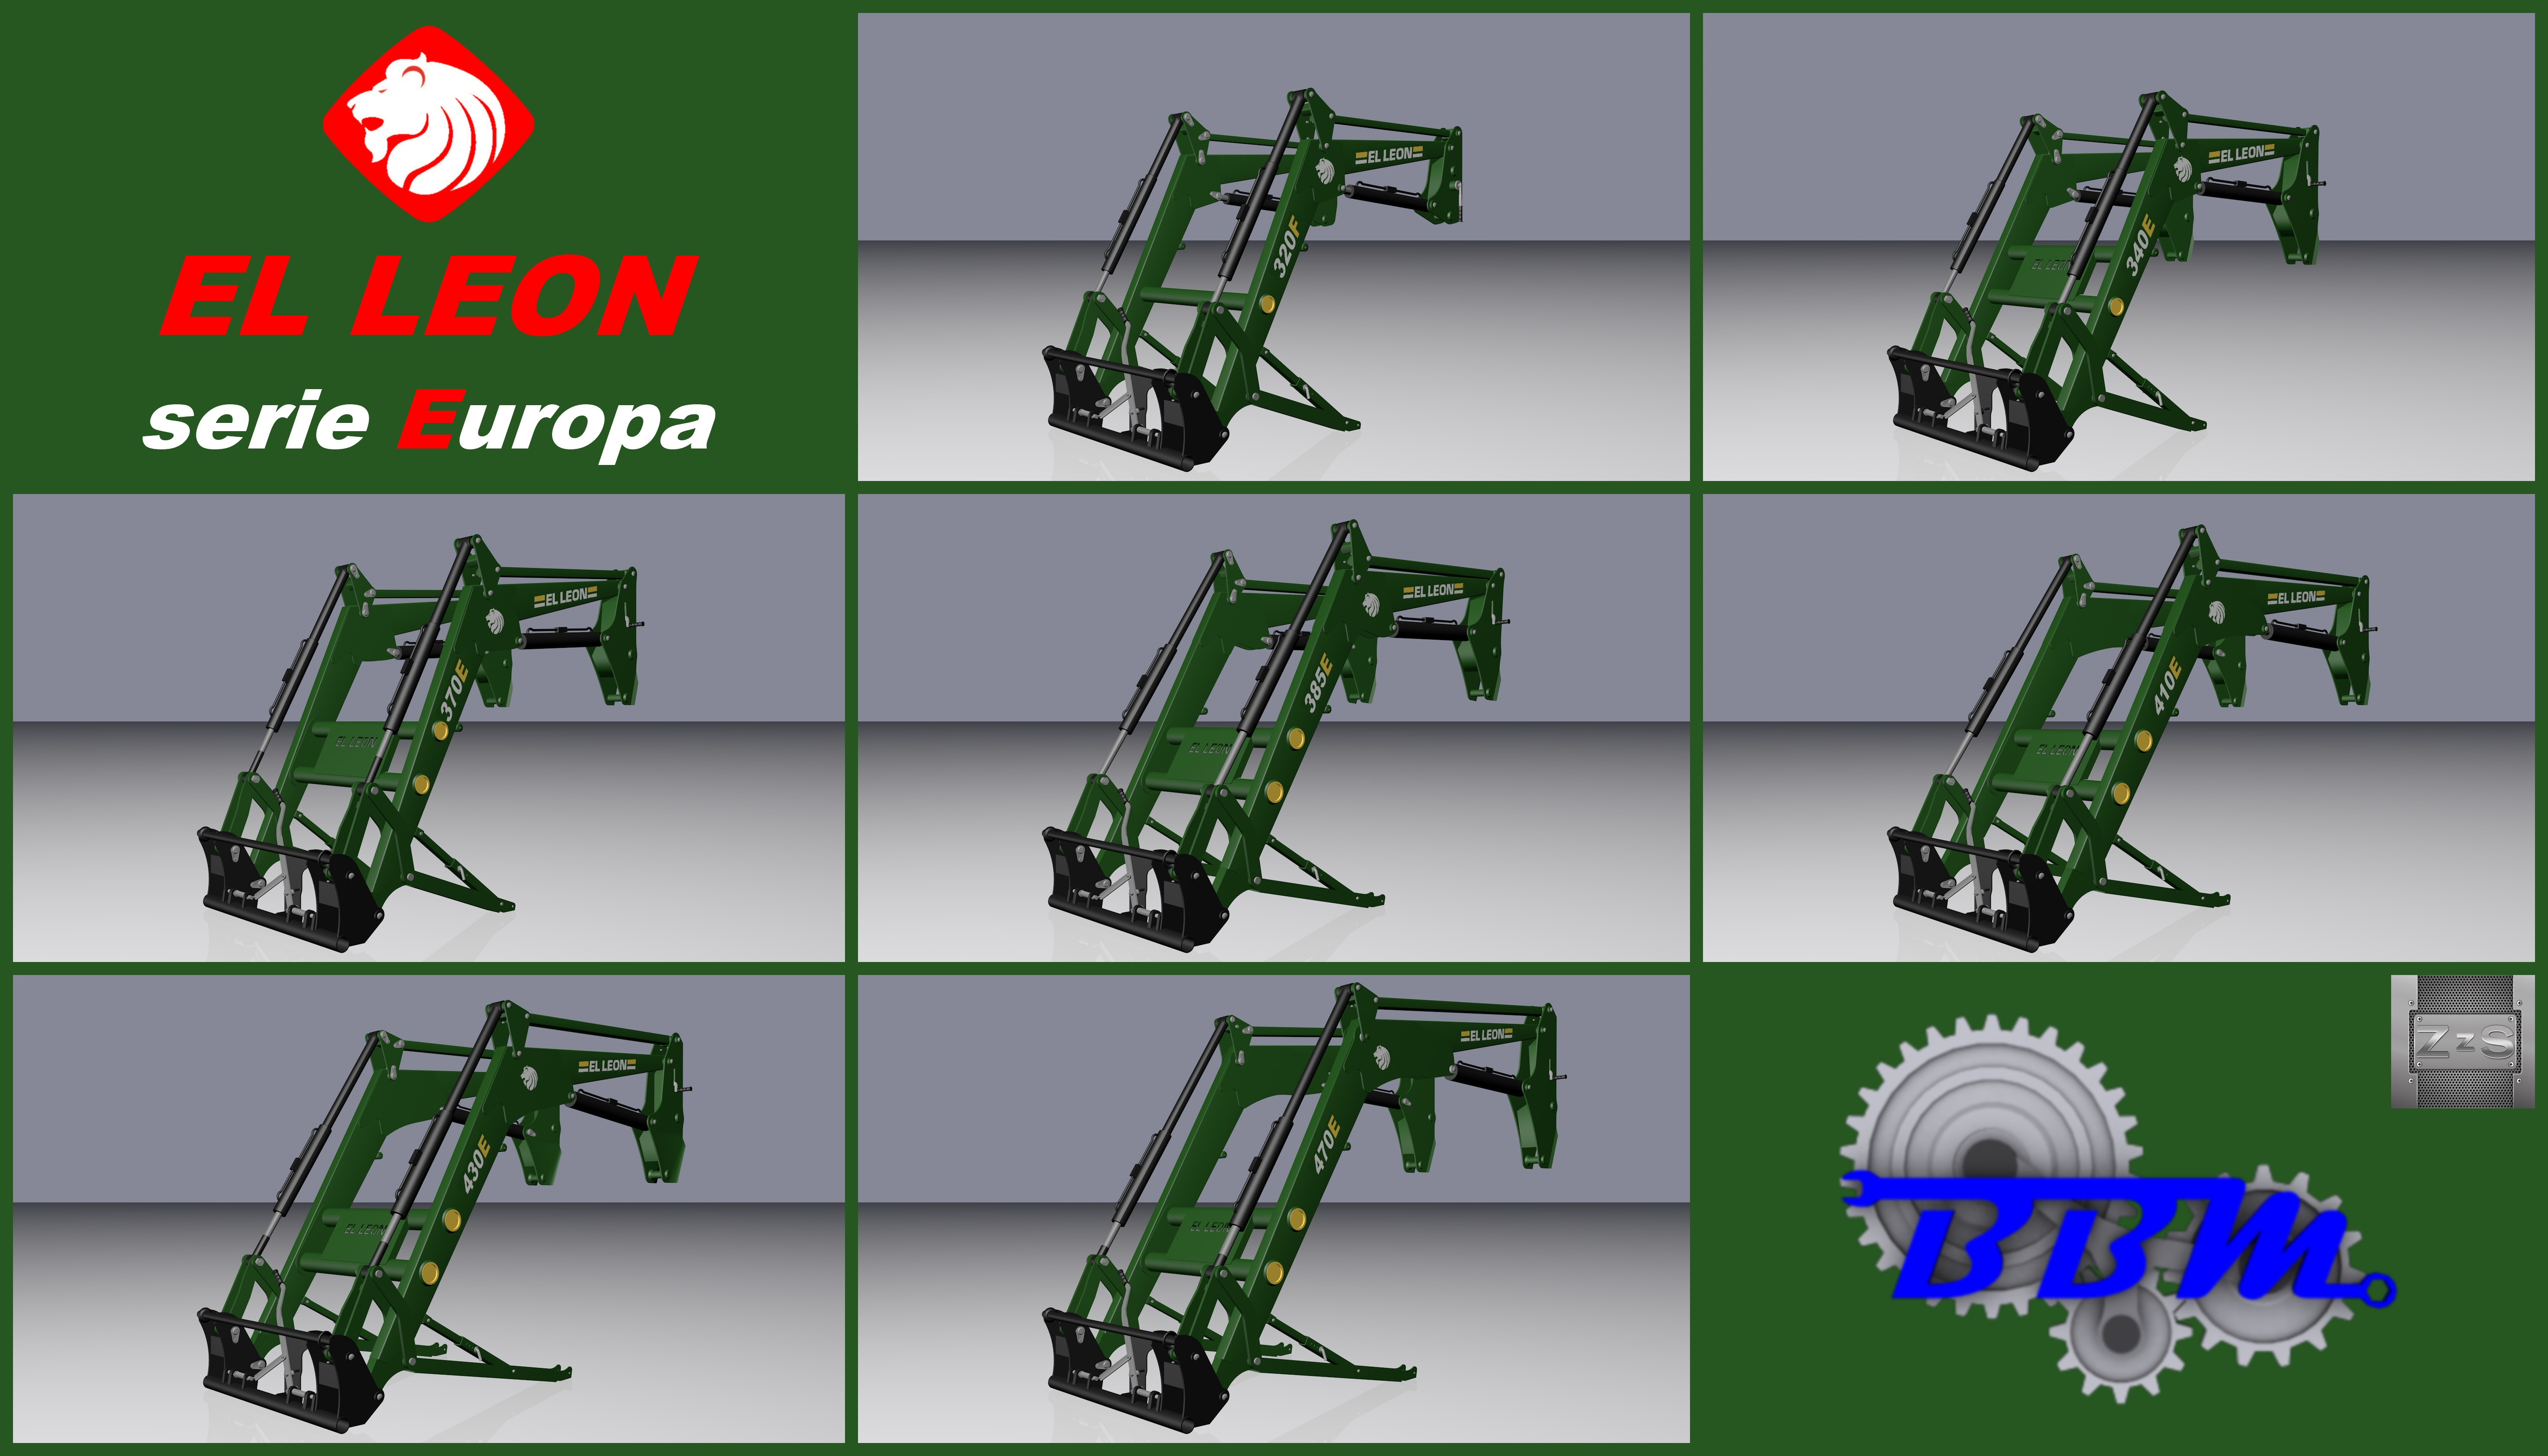 [T.E.P.] Proyecto Palas El León + Accesorios [Actualizado 7-6-2014] Seriejohndeerep6uph